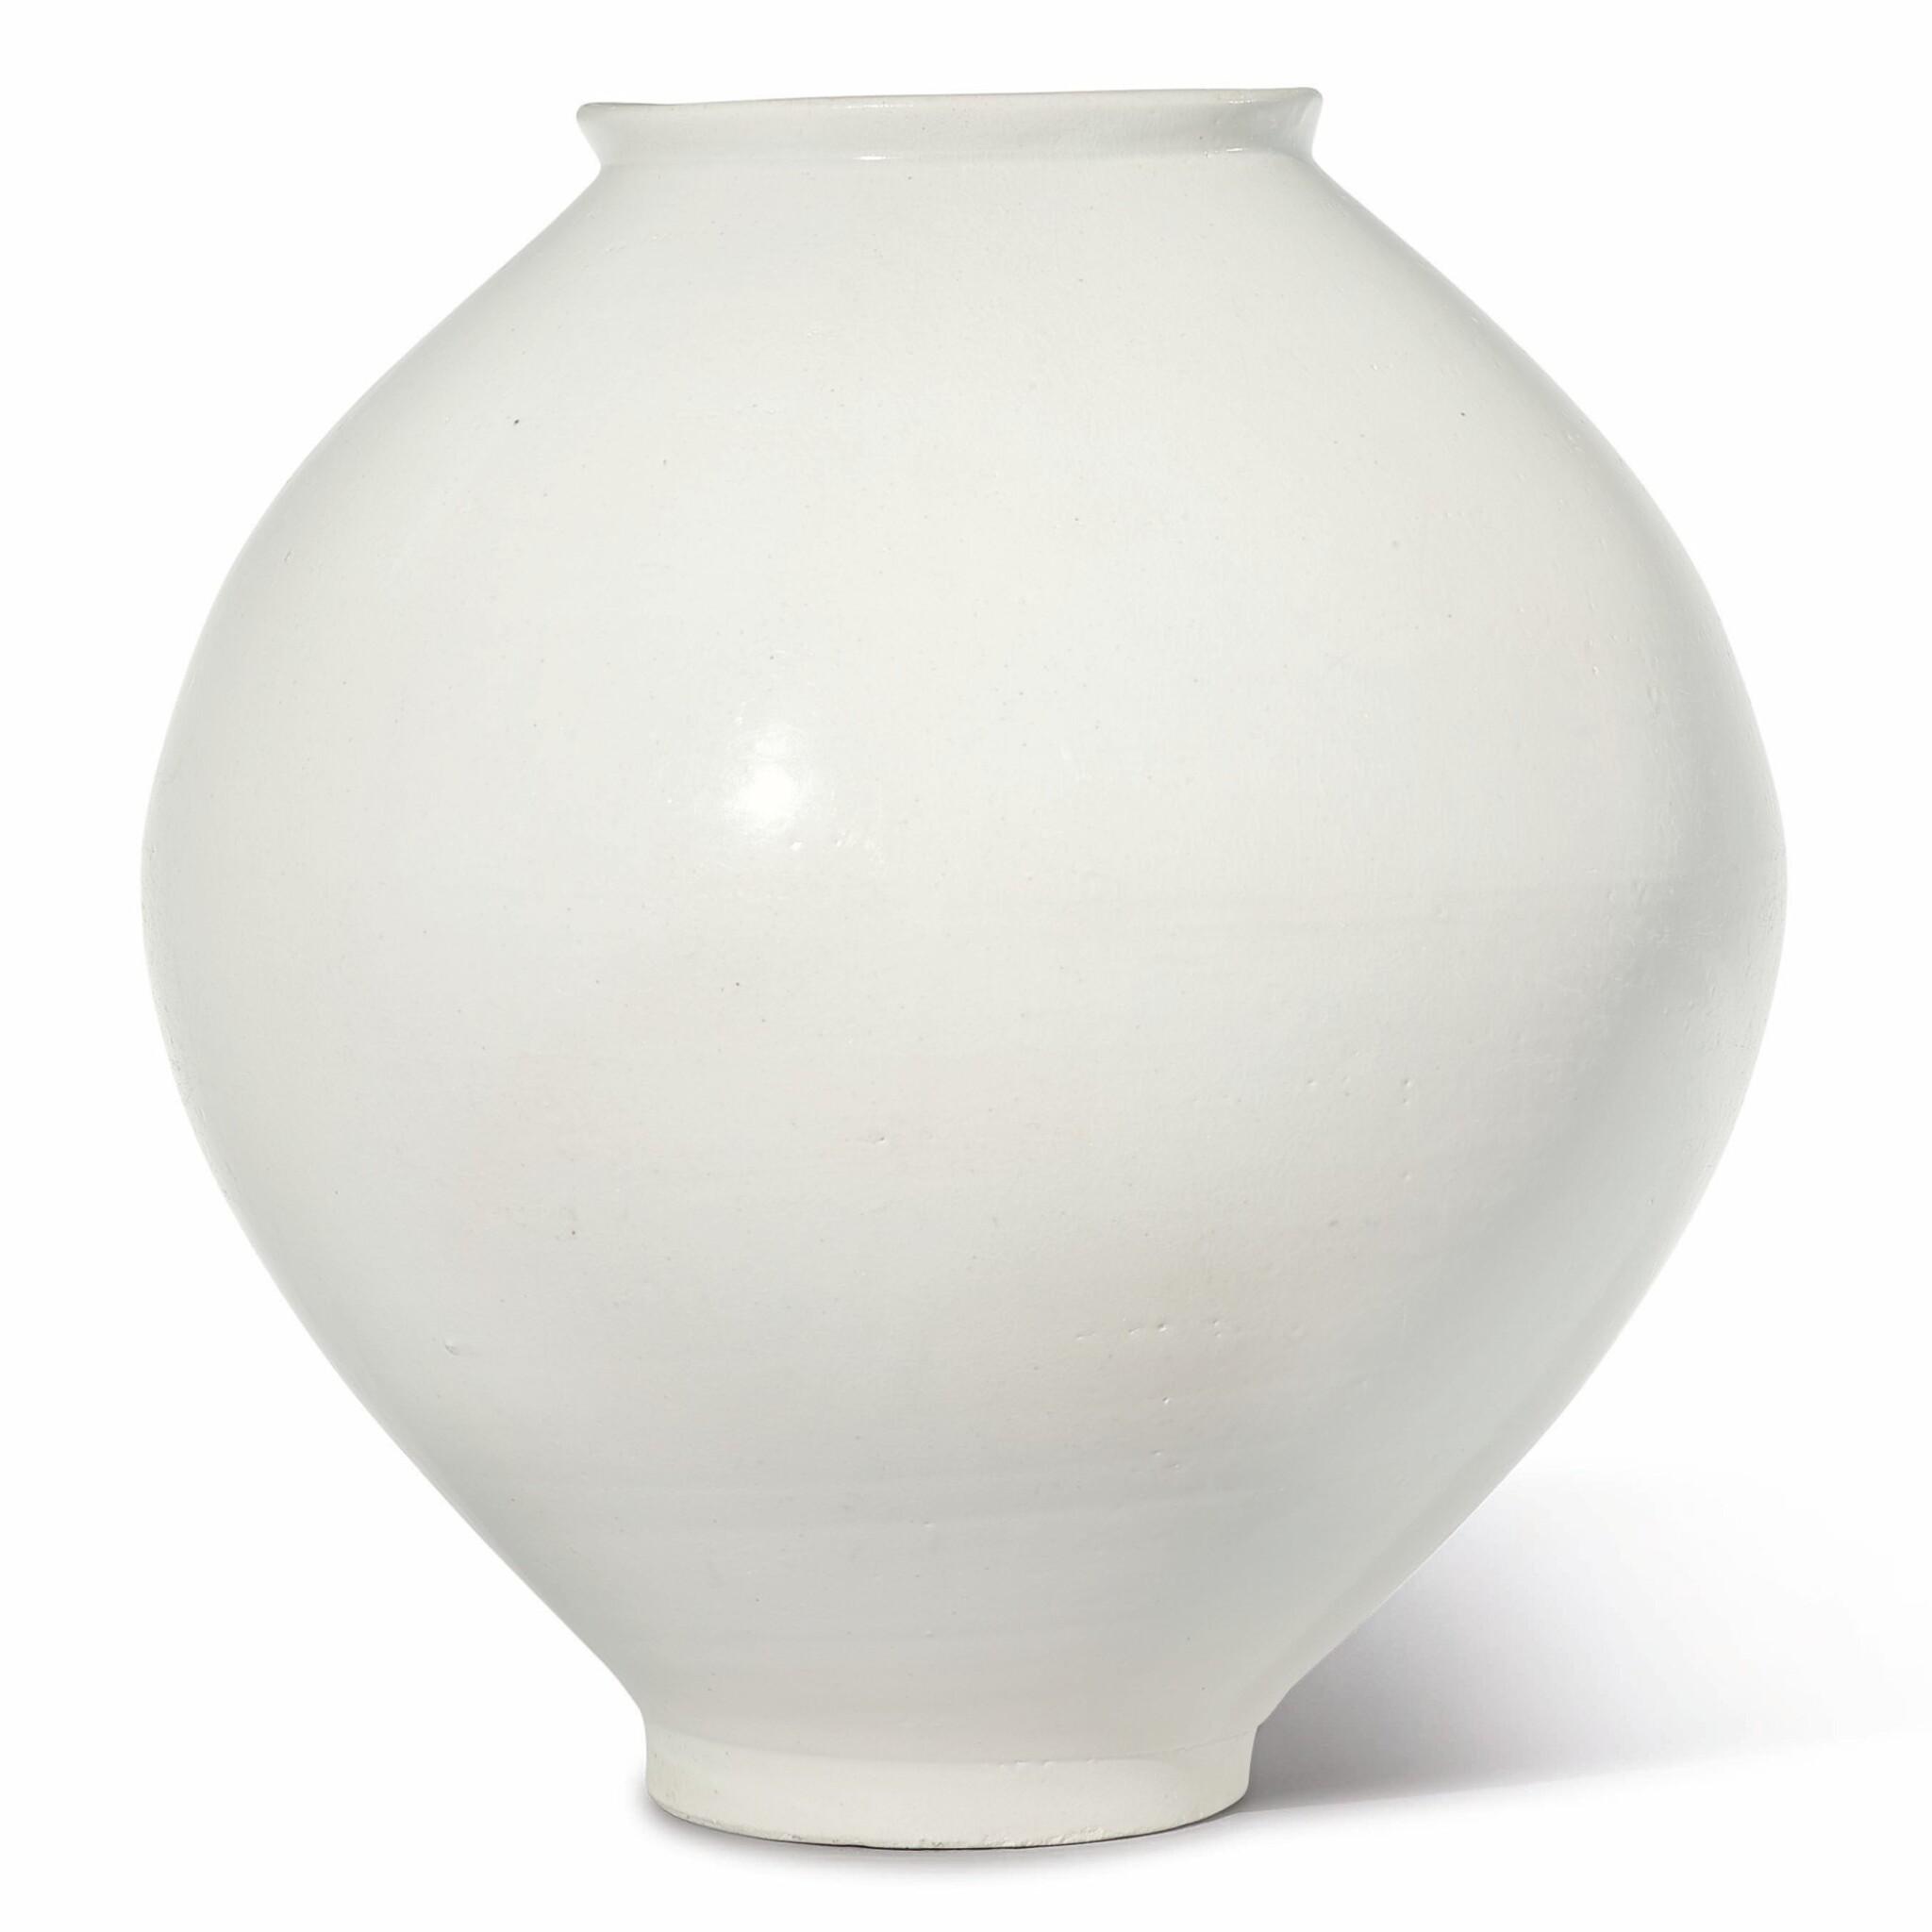 View full screen - View 1 of Lot 129. A luminous white moon jar, Korea, Joseon dynasty, 18th century | 朝鮮王朝 十八世紀 白釉滿月花罐.